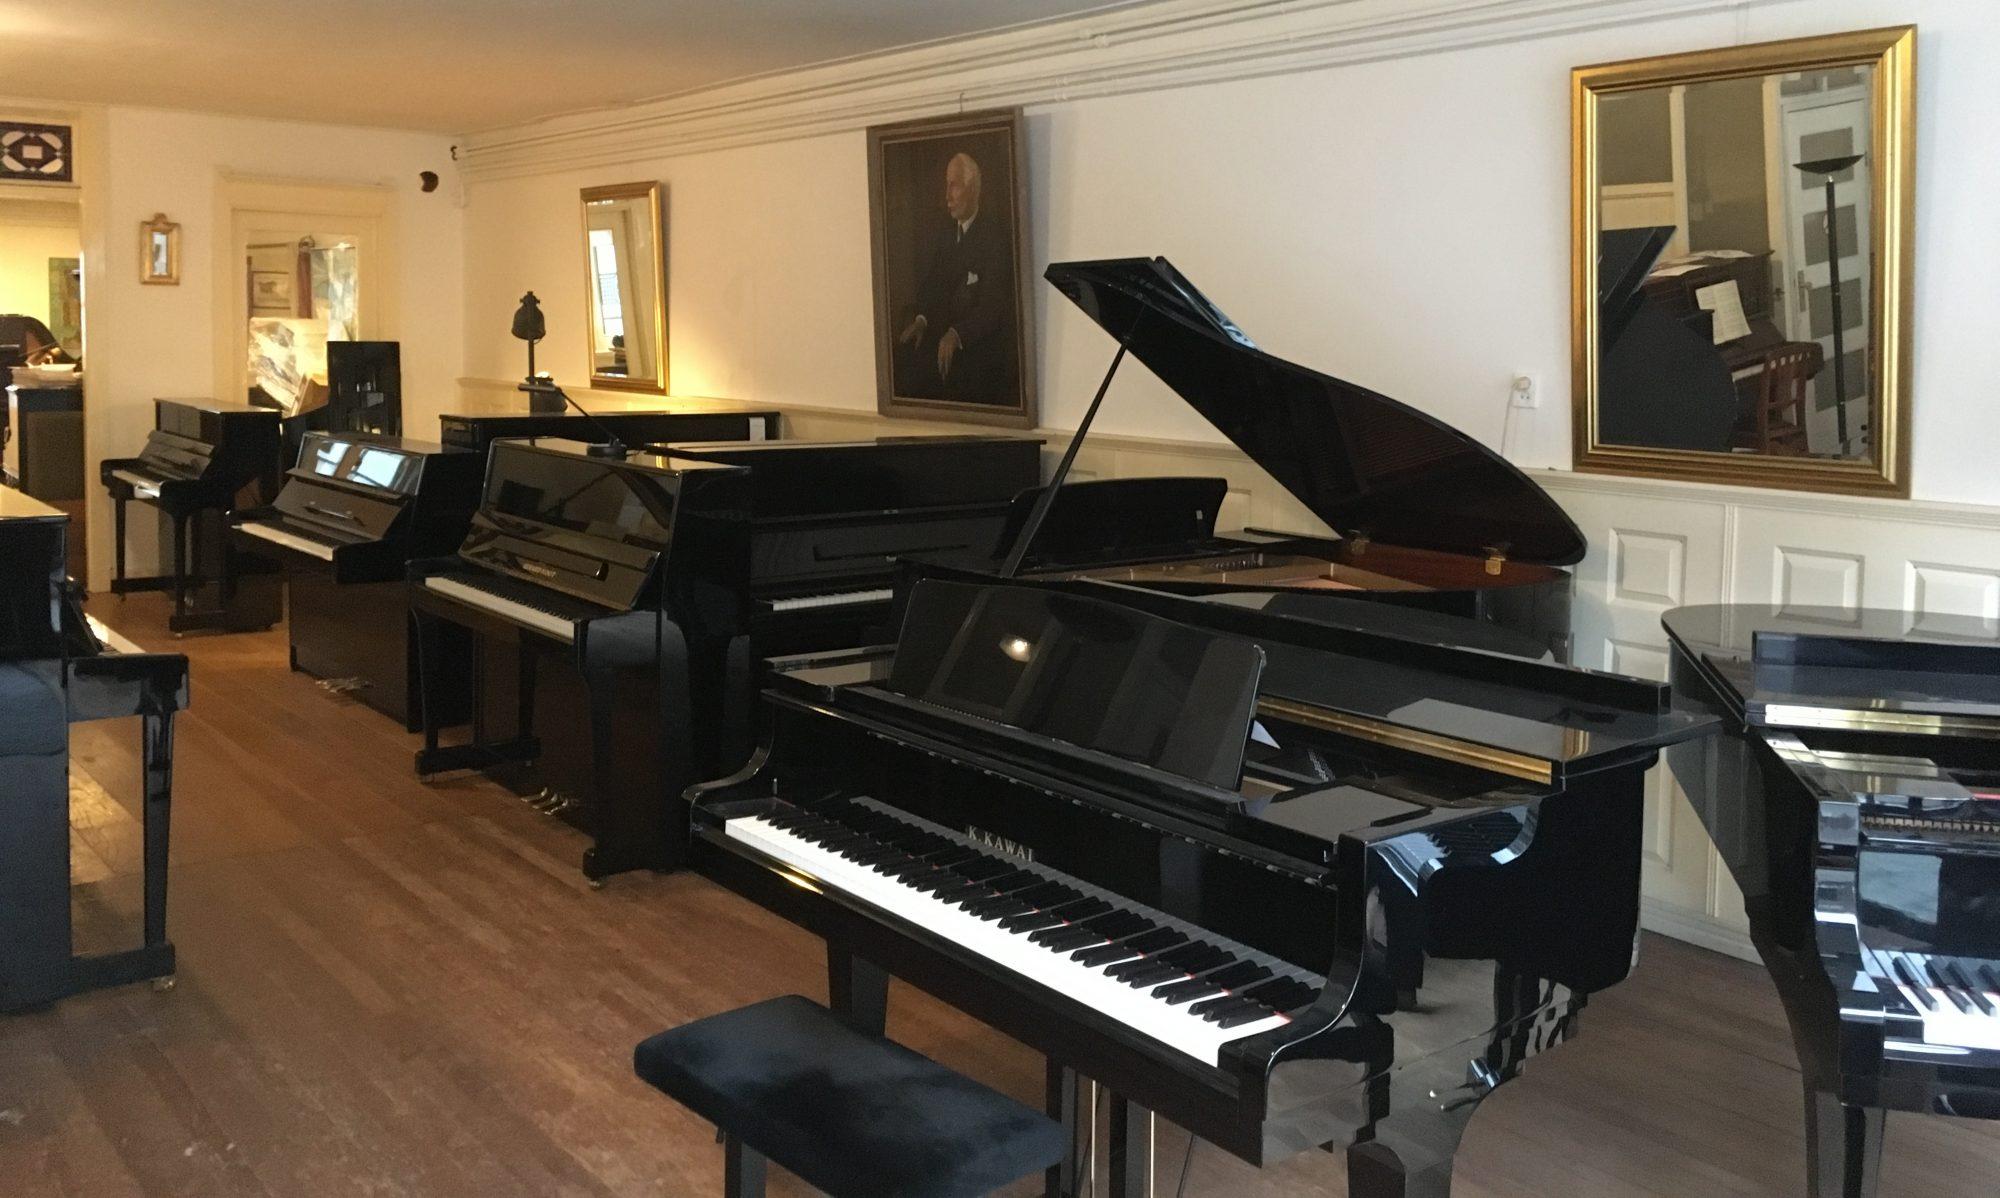 Koot piano's vleugels Haarlem